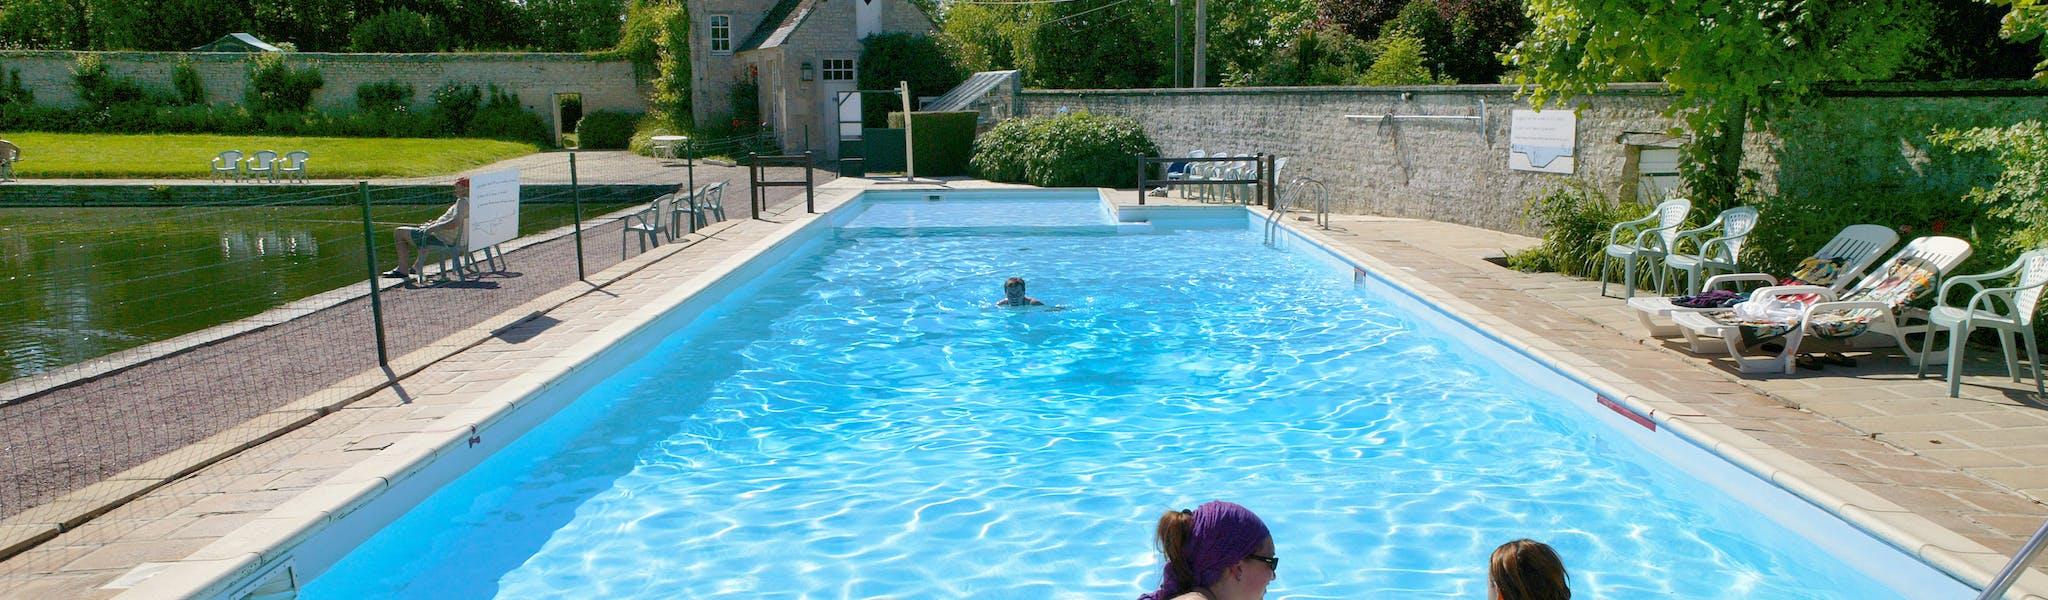 Zwembad camping Chateau de Martragny